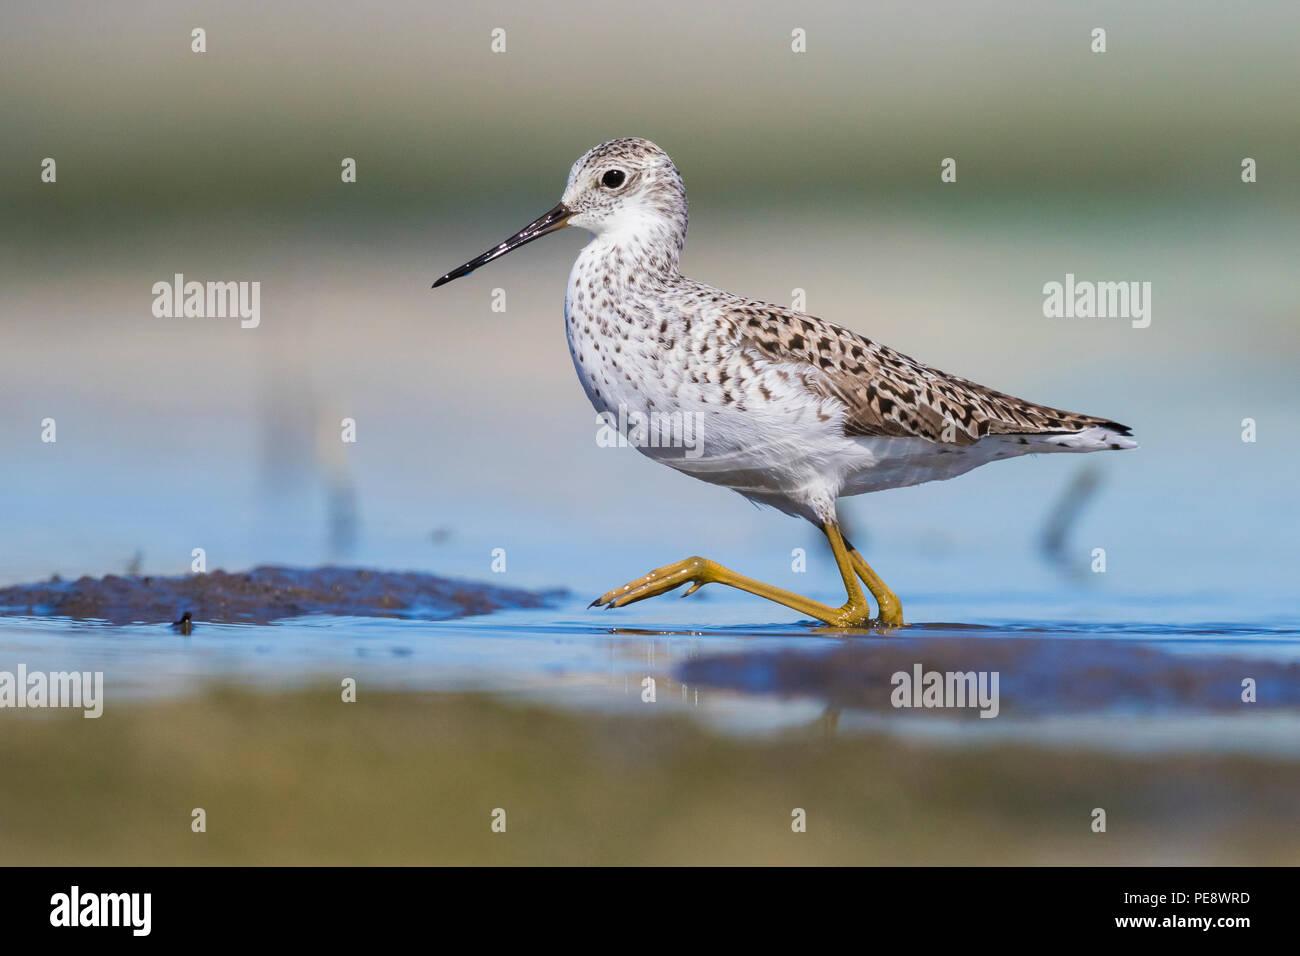 Marsh Sandpiper (Tringa stagnatilis), adult walking in a pond - Stock Image